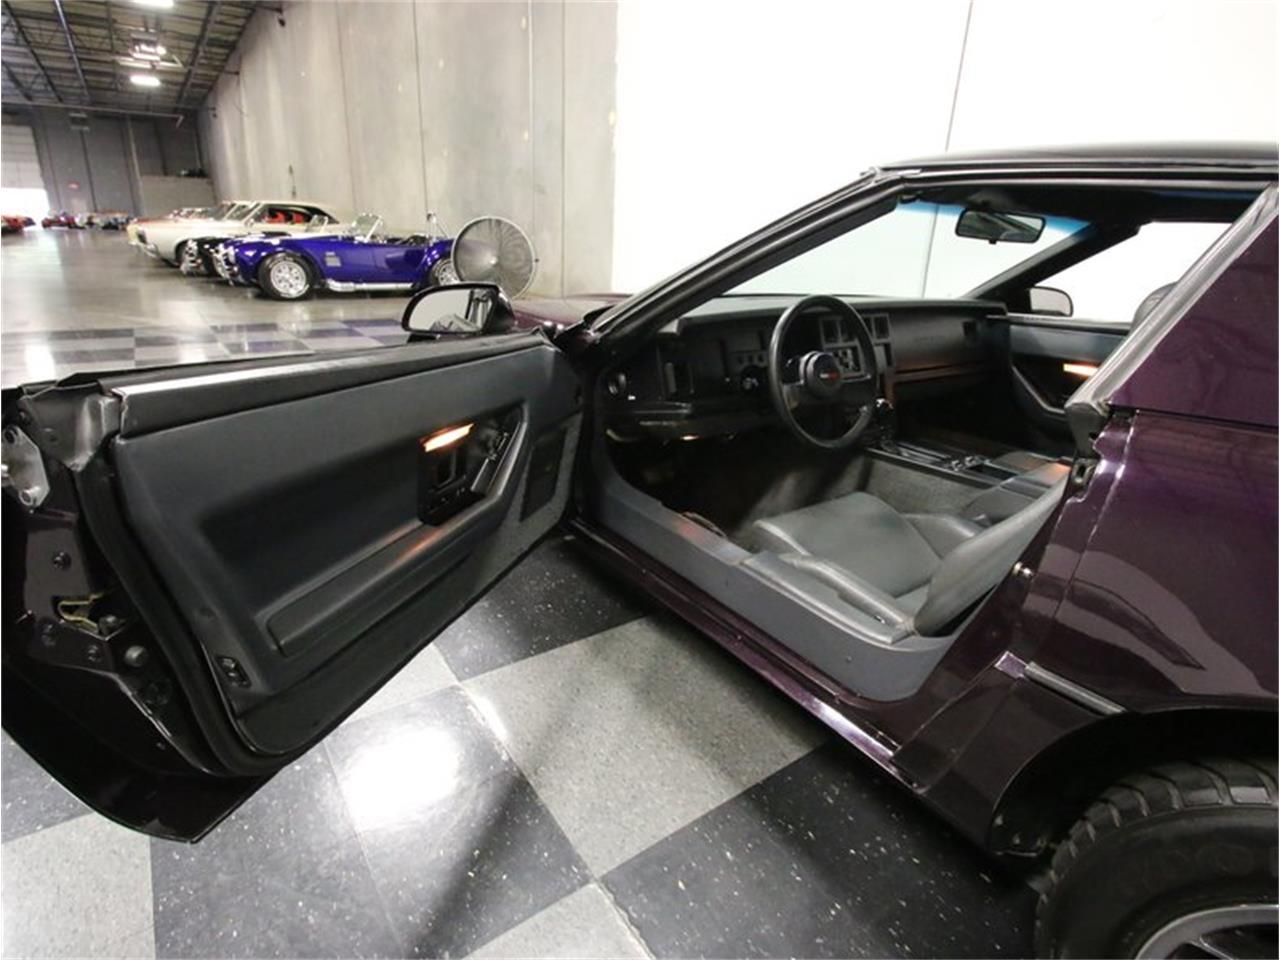 Large Picture of 1985 Corvette located in Georgia - $14,995.00 Offered by Streetside Classics - Atlanta - FPQQ